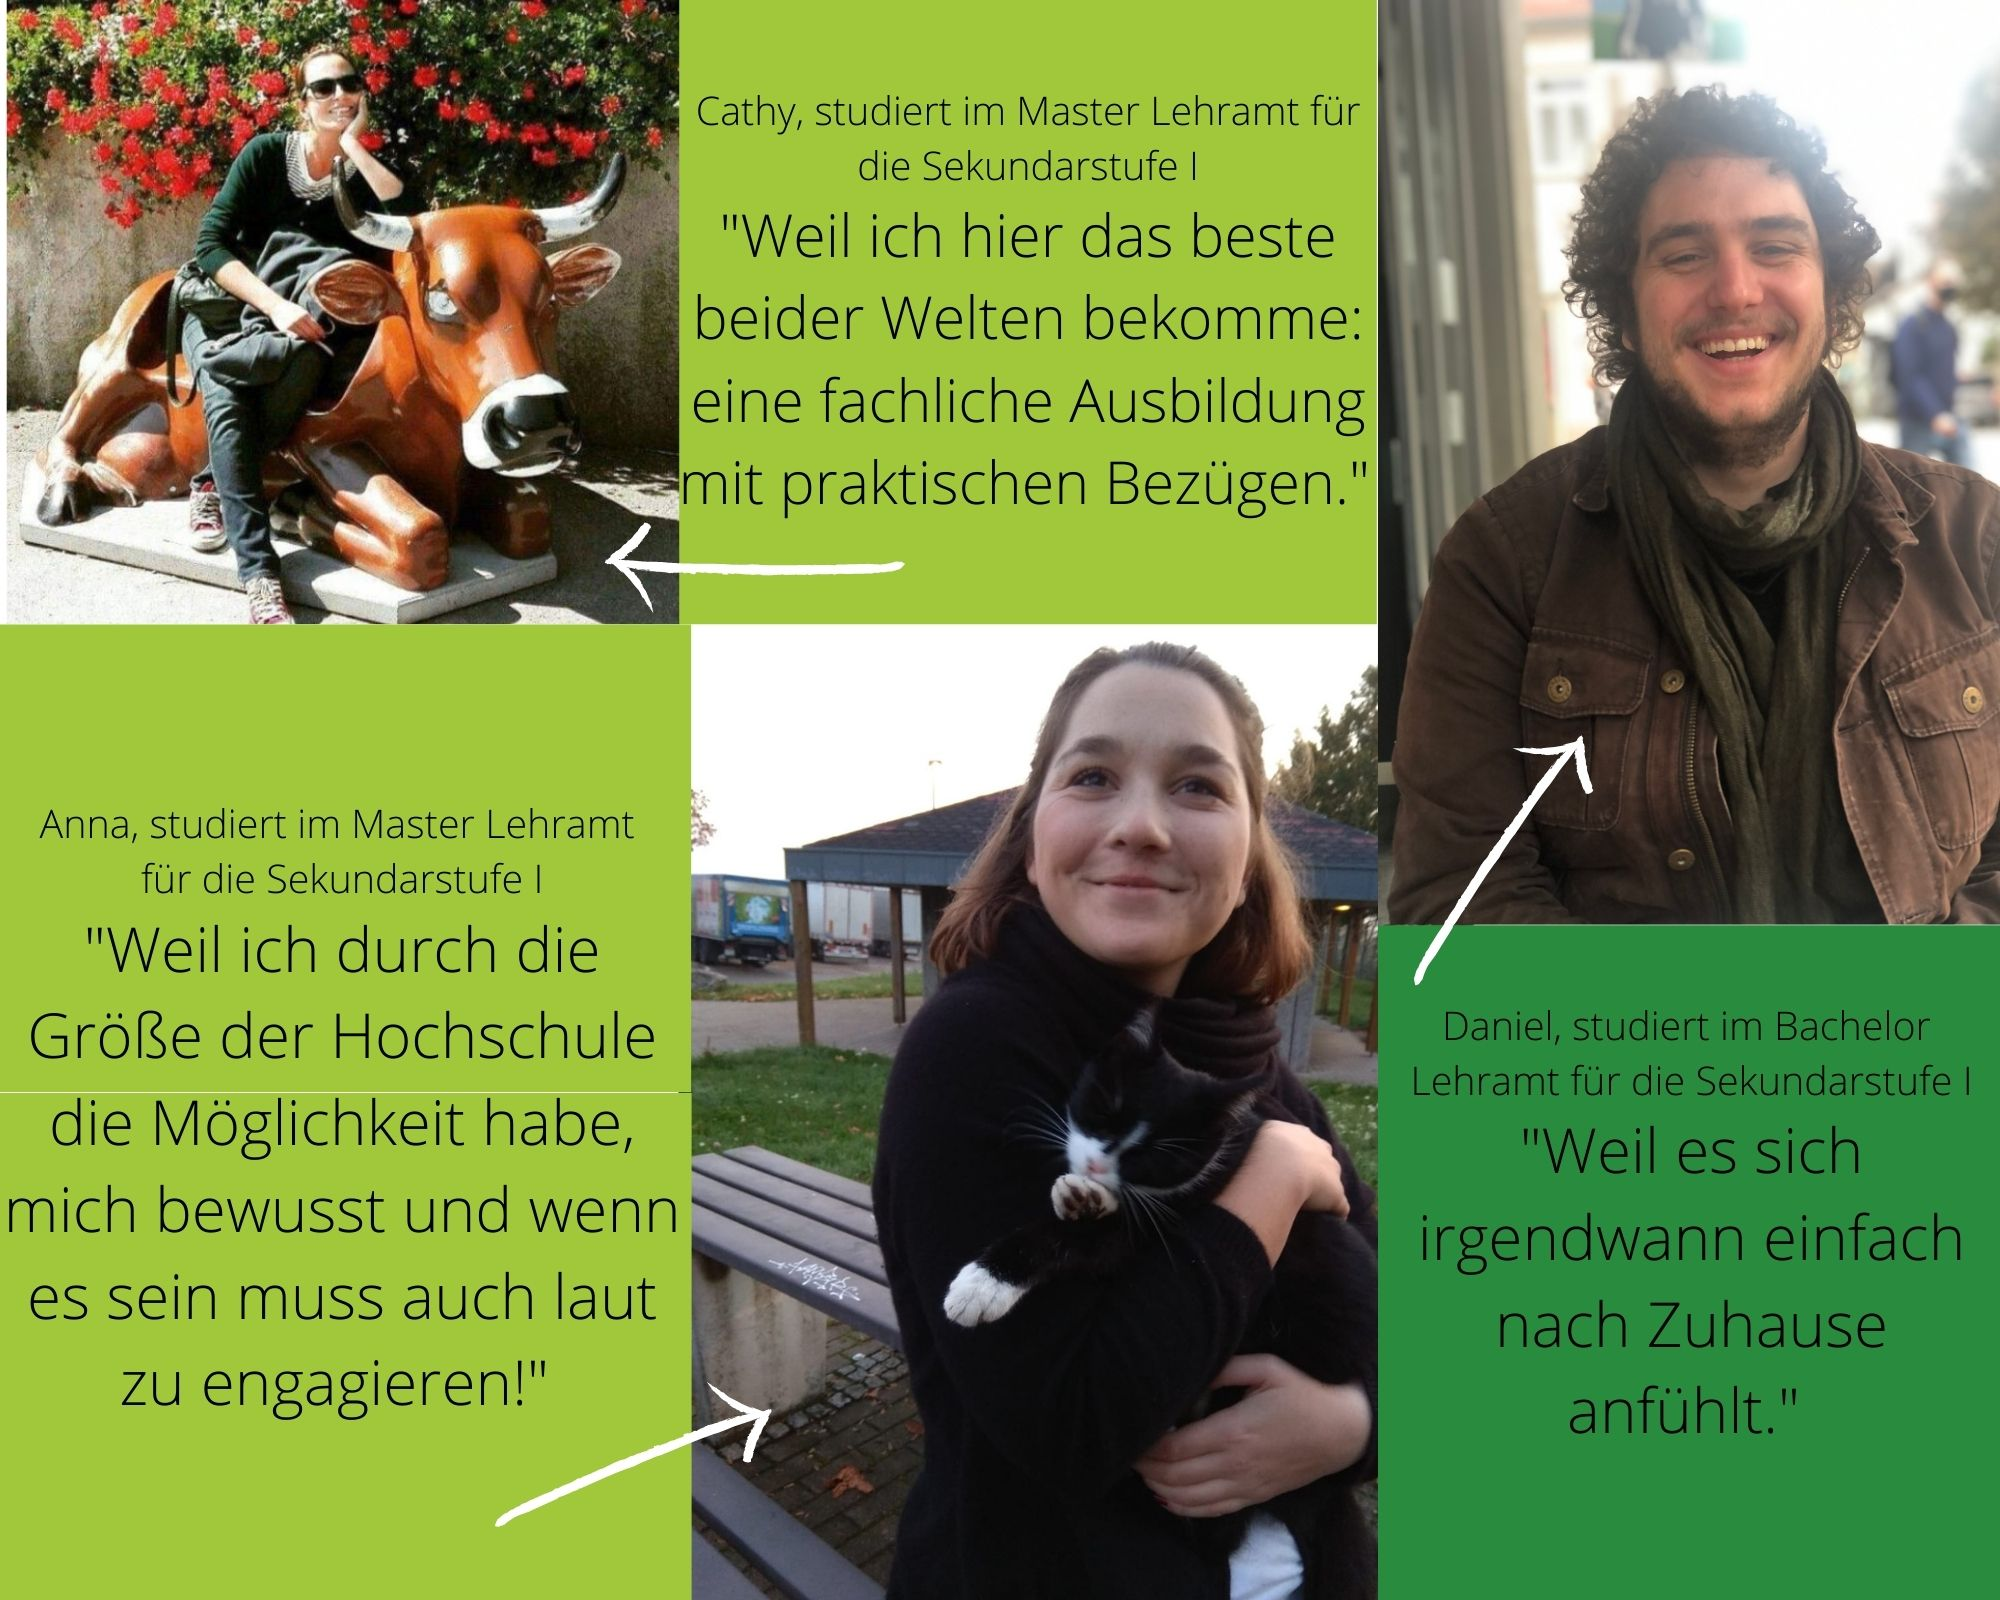 Studieren an der PH Ludwigsburg